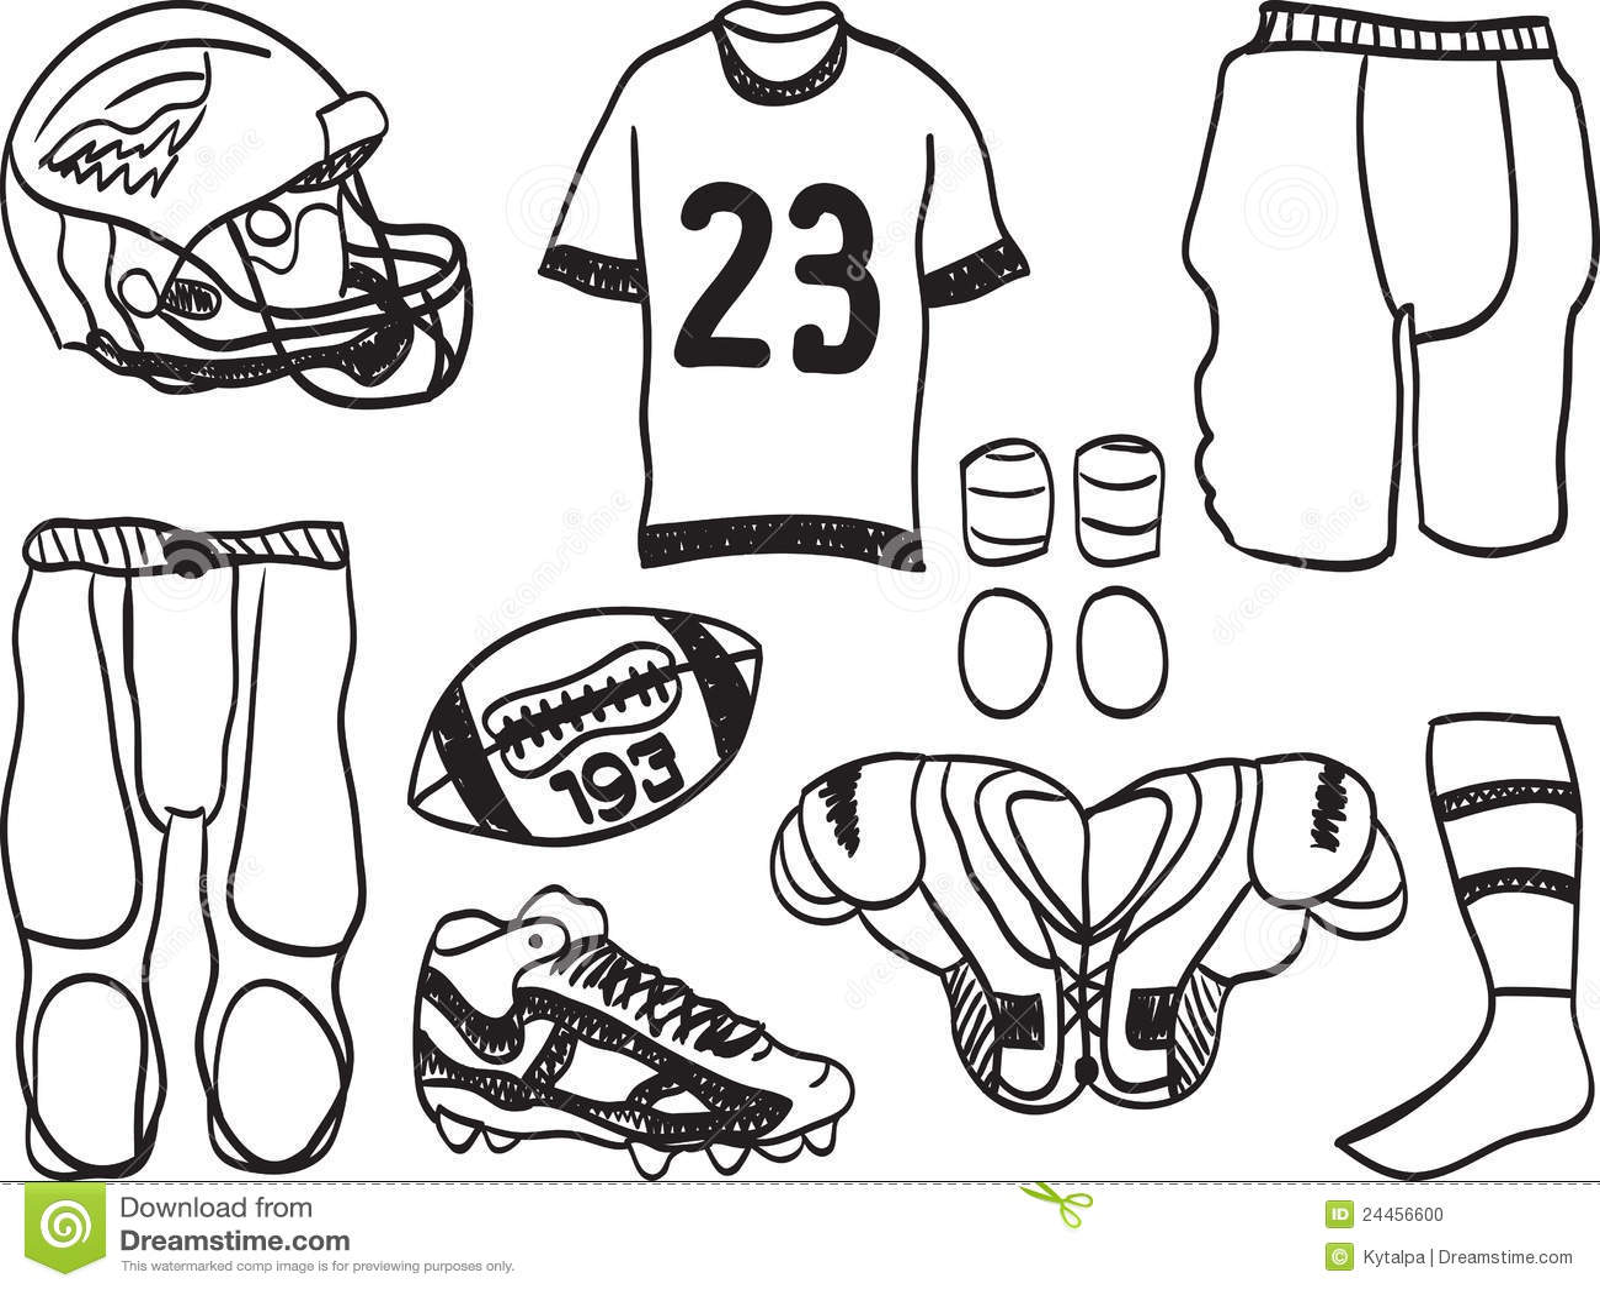 American Football Equipment Stock Vector